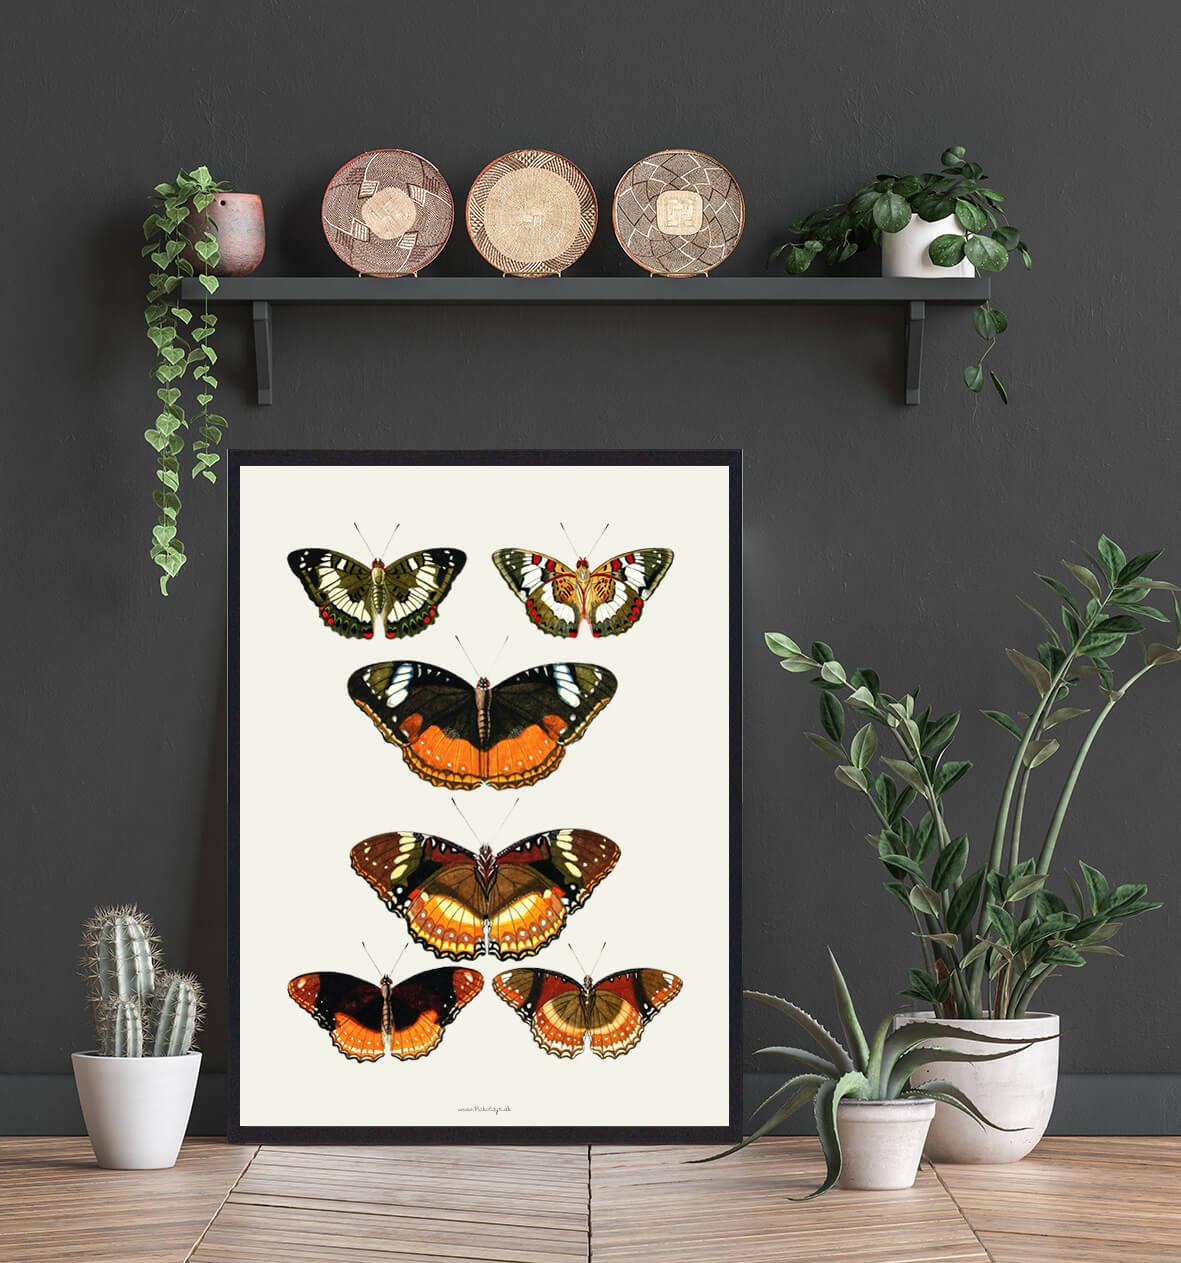 plakat-sommerfugle-indretning-3